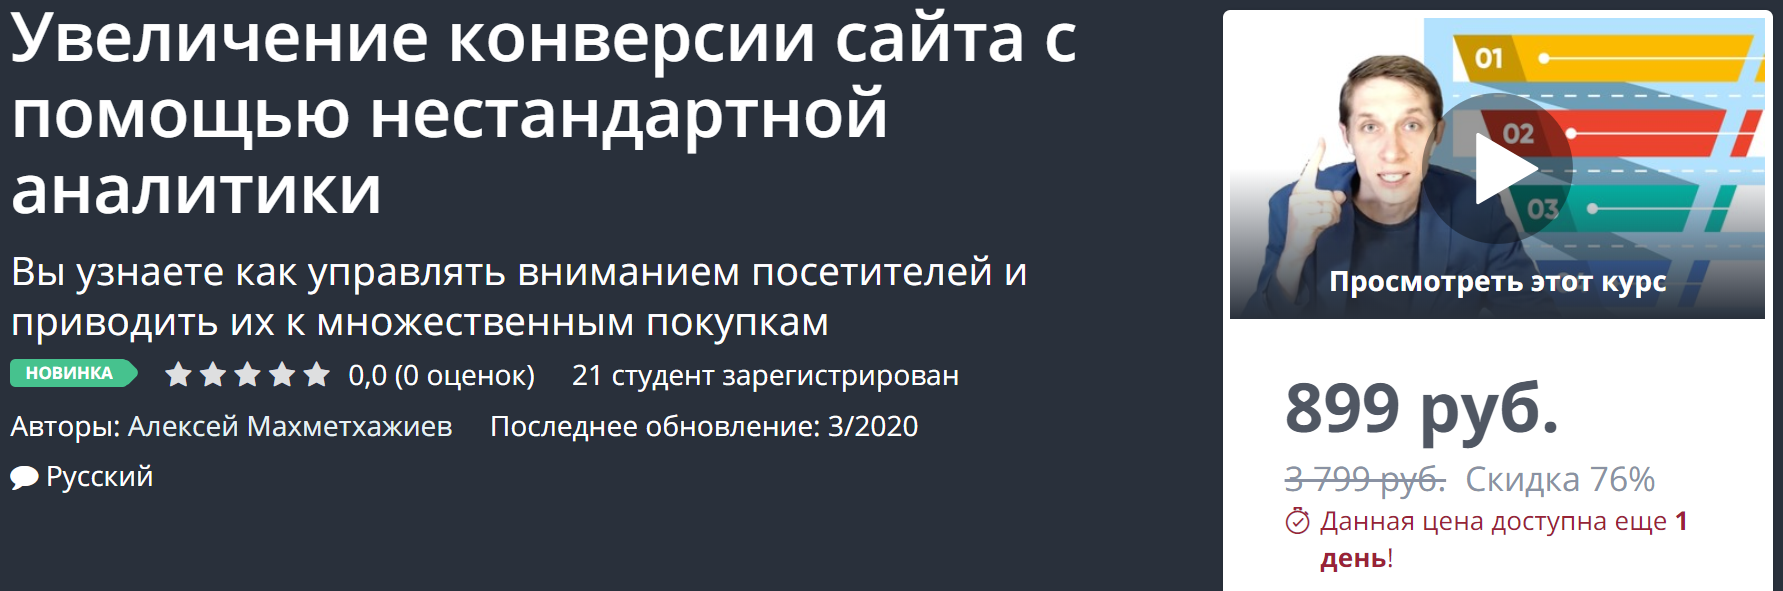 2020-03-26_15-46-55